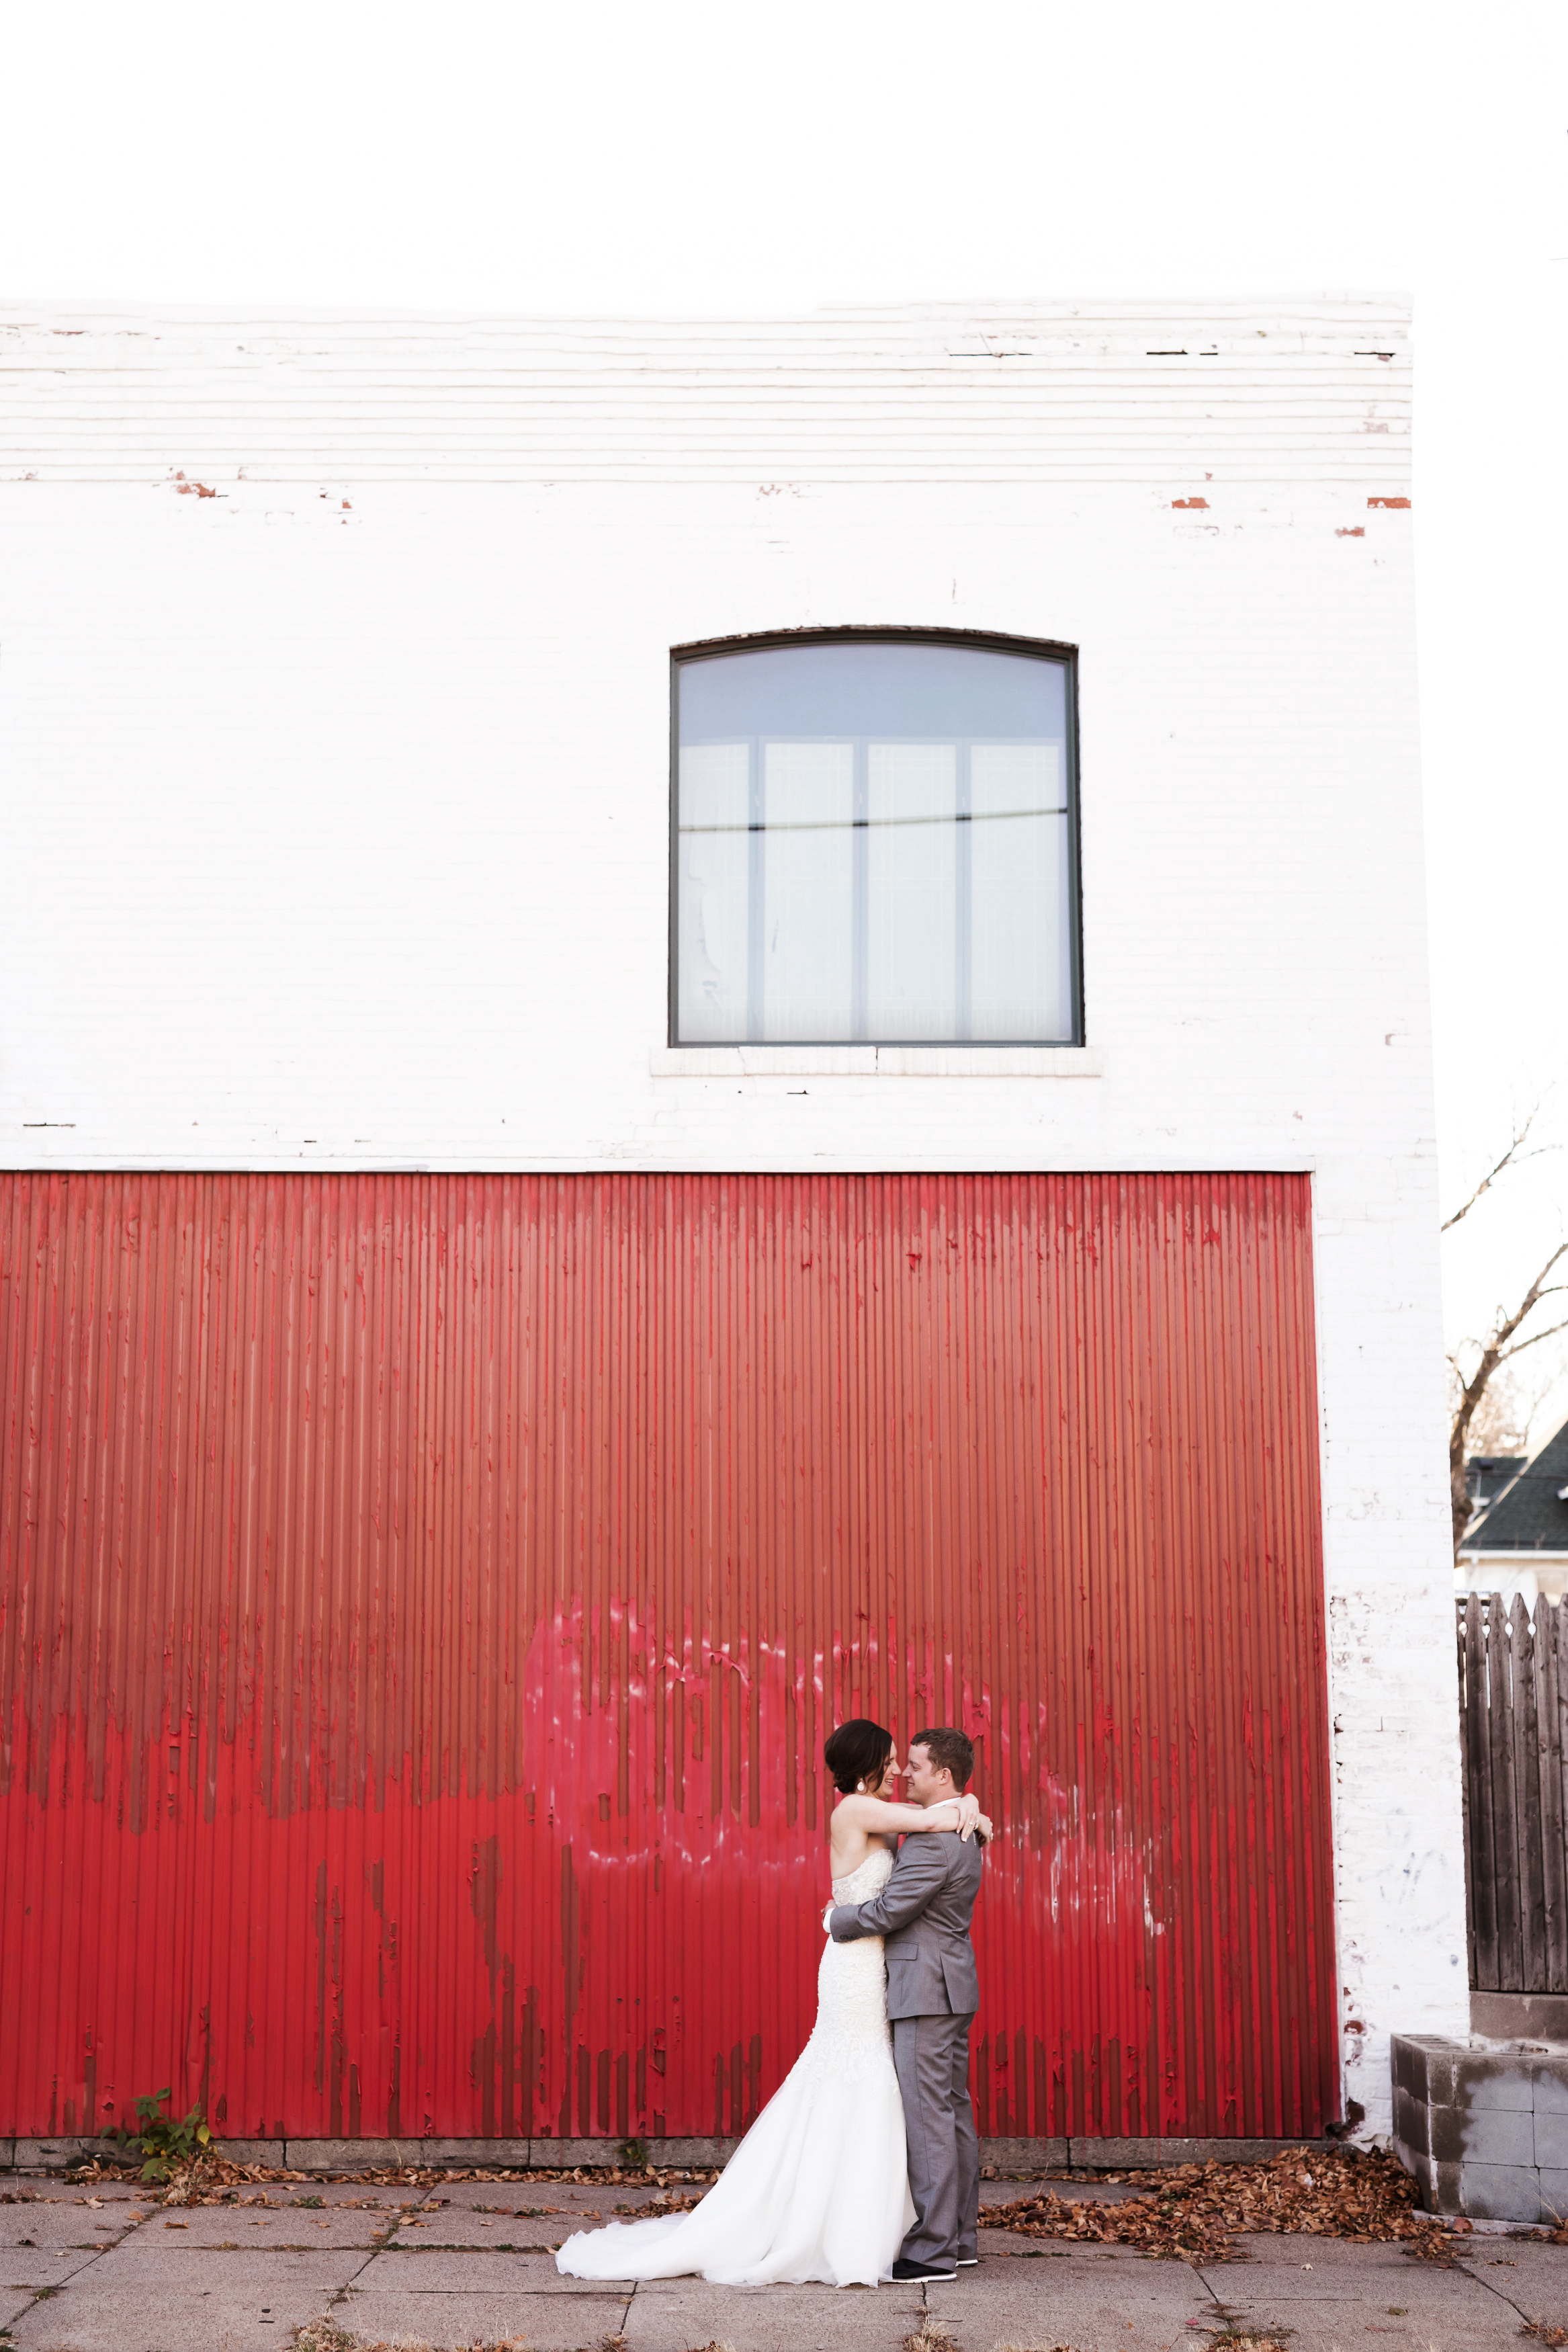 clewellphotography-2476.jpg